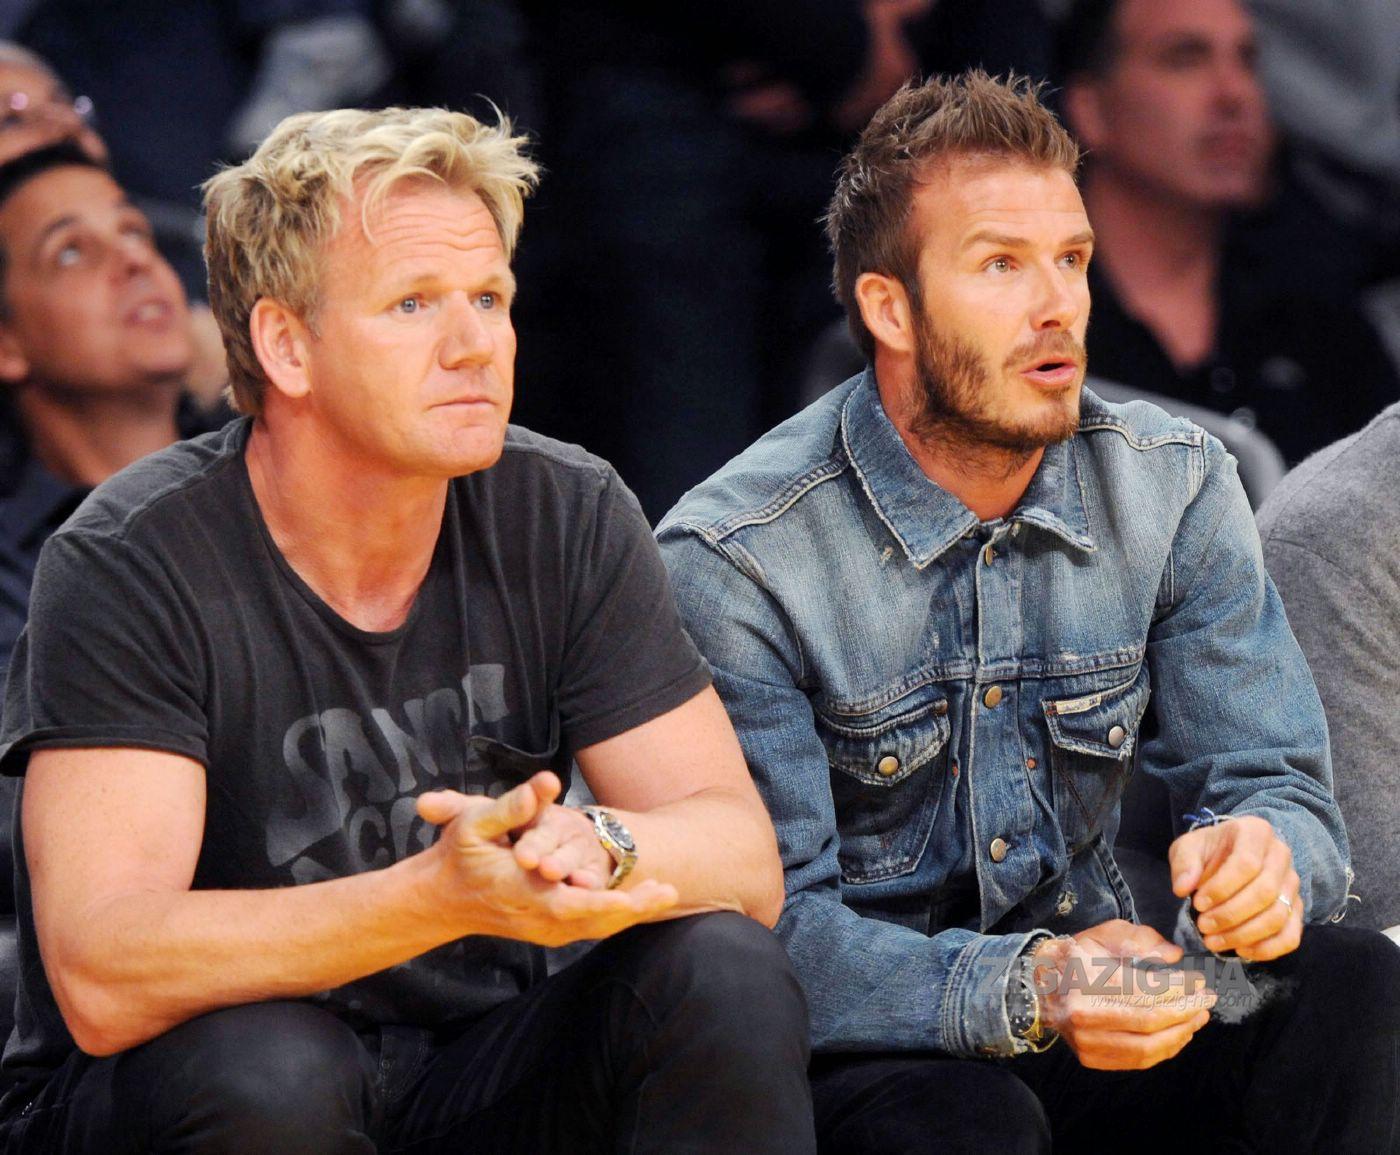 David-Beckham-Gordon-Ramsey-at-the-Lakers-46